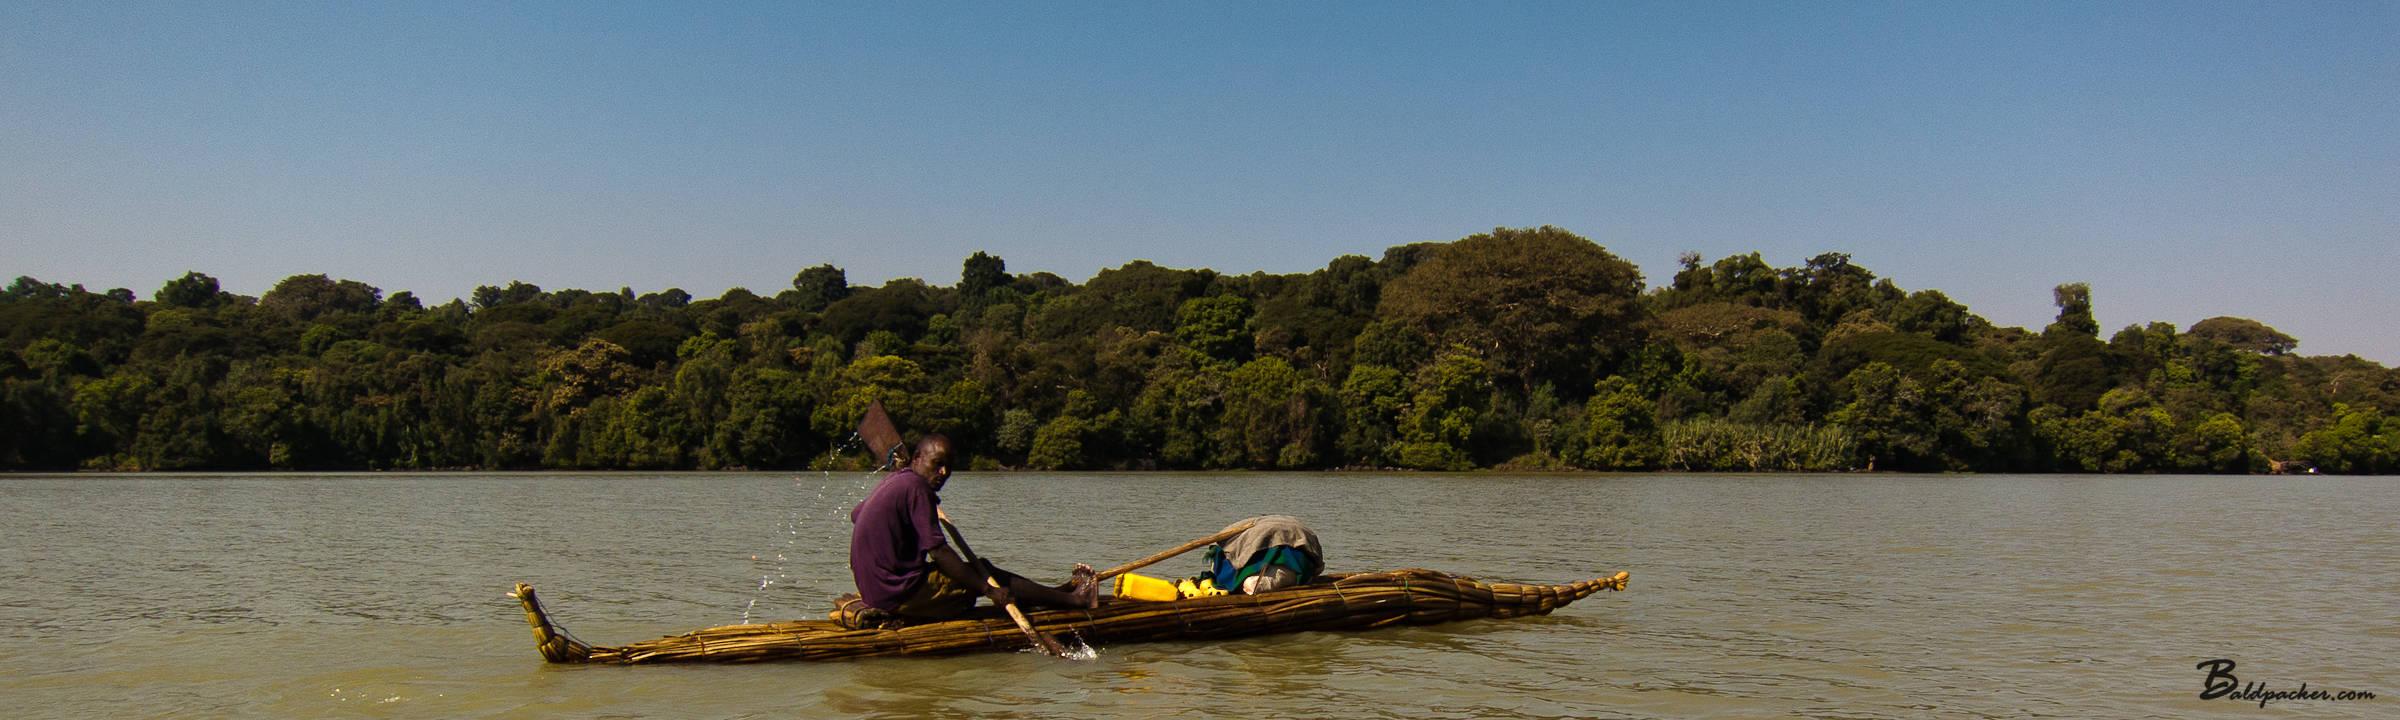 Ethiopia: Bahar Dar and Lake Tana Monasteries